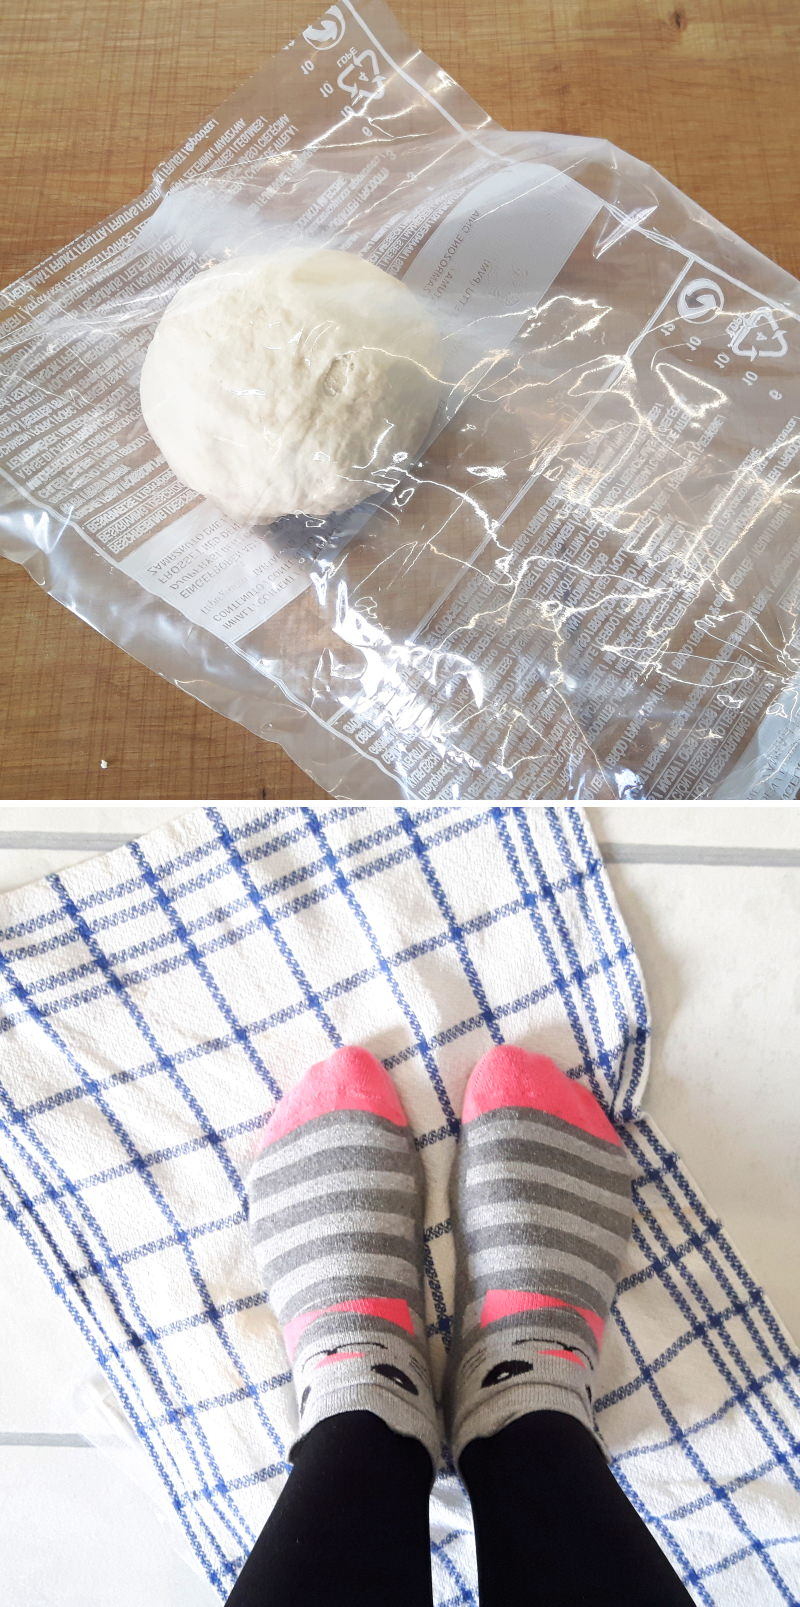 Udon Nudeln selbst machen Schritt 4 Teig kneten